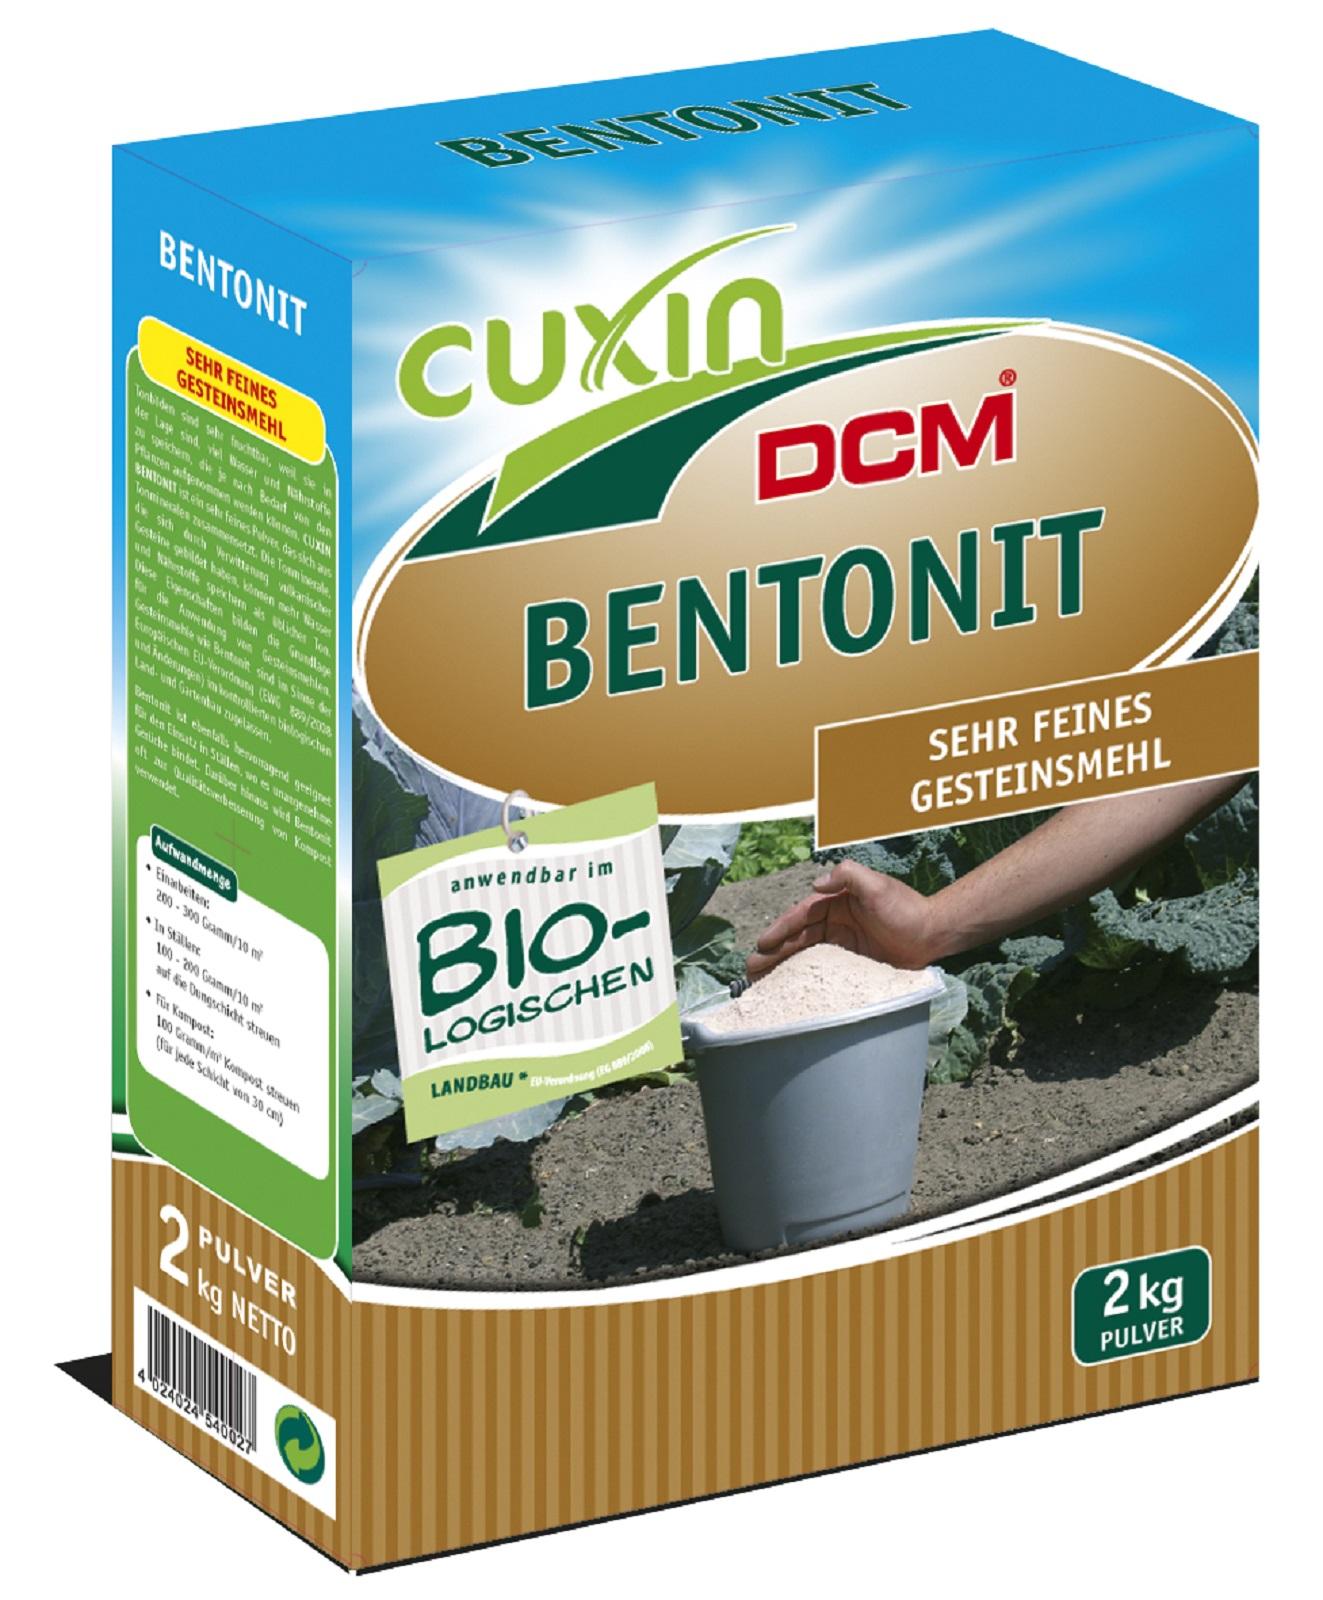 Cuxin Bentonit 2 kg Kompostierhilfe Garten  Nährstoffspeicher Bodenverbesserer